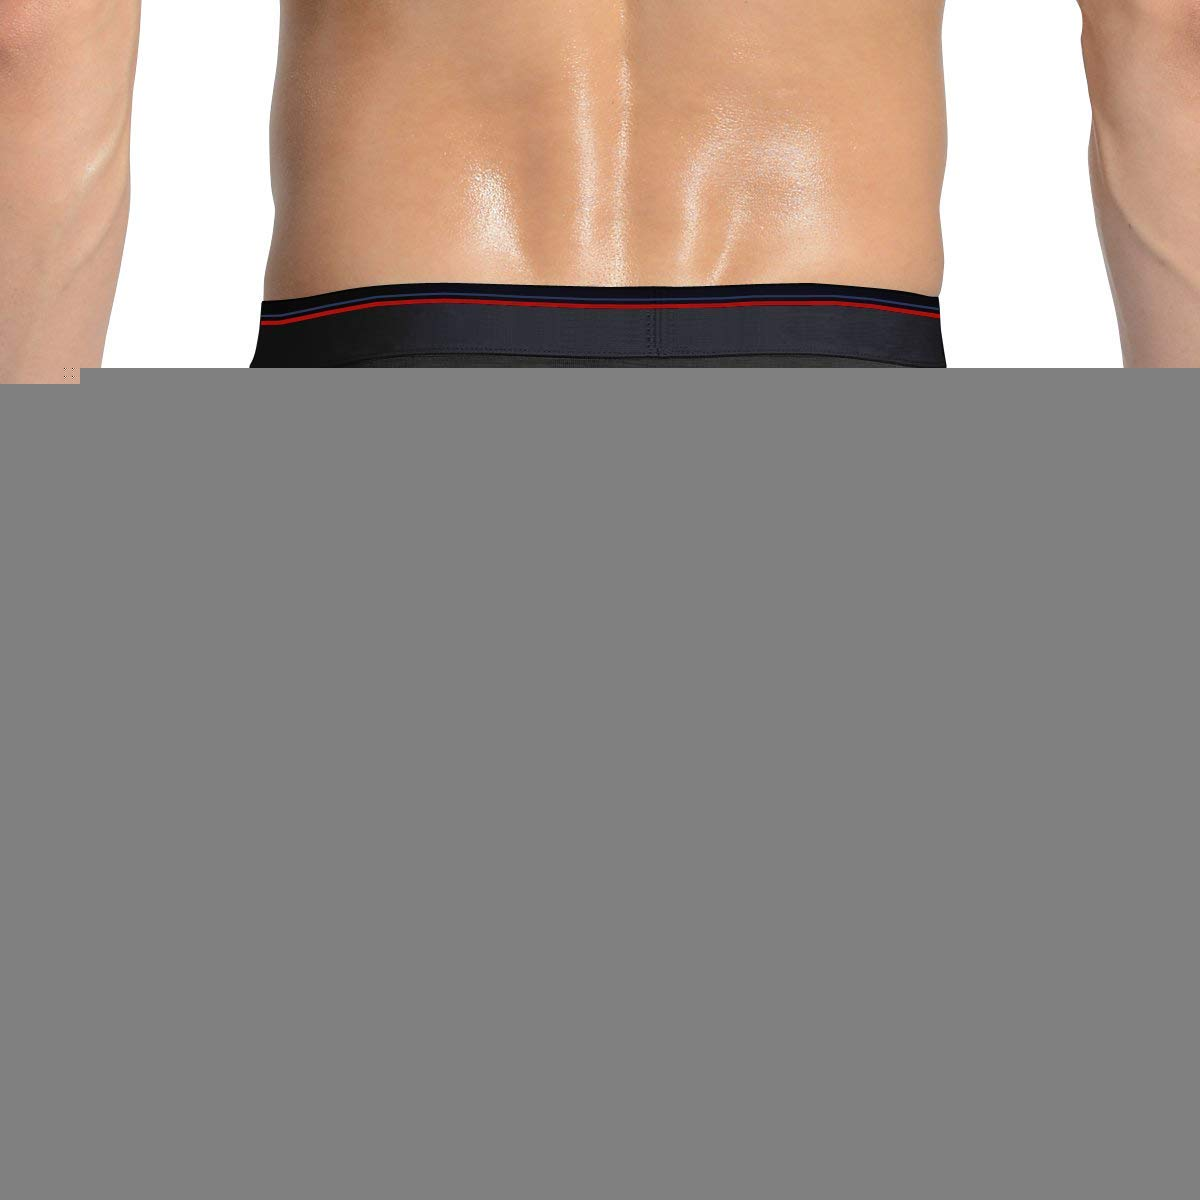 Vintage Style Spearfishing,Mens Cotton Underwear Shorts Underpants Briefs Underpants Hot Shorts Male Panties Man Boxer